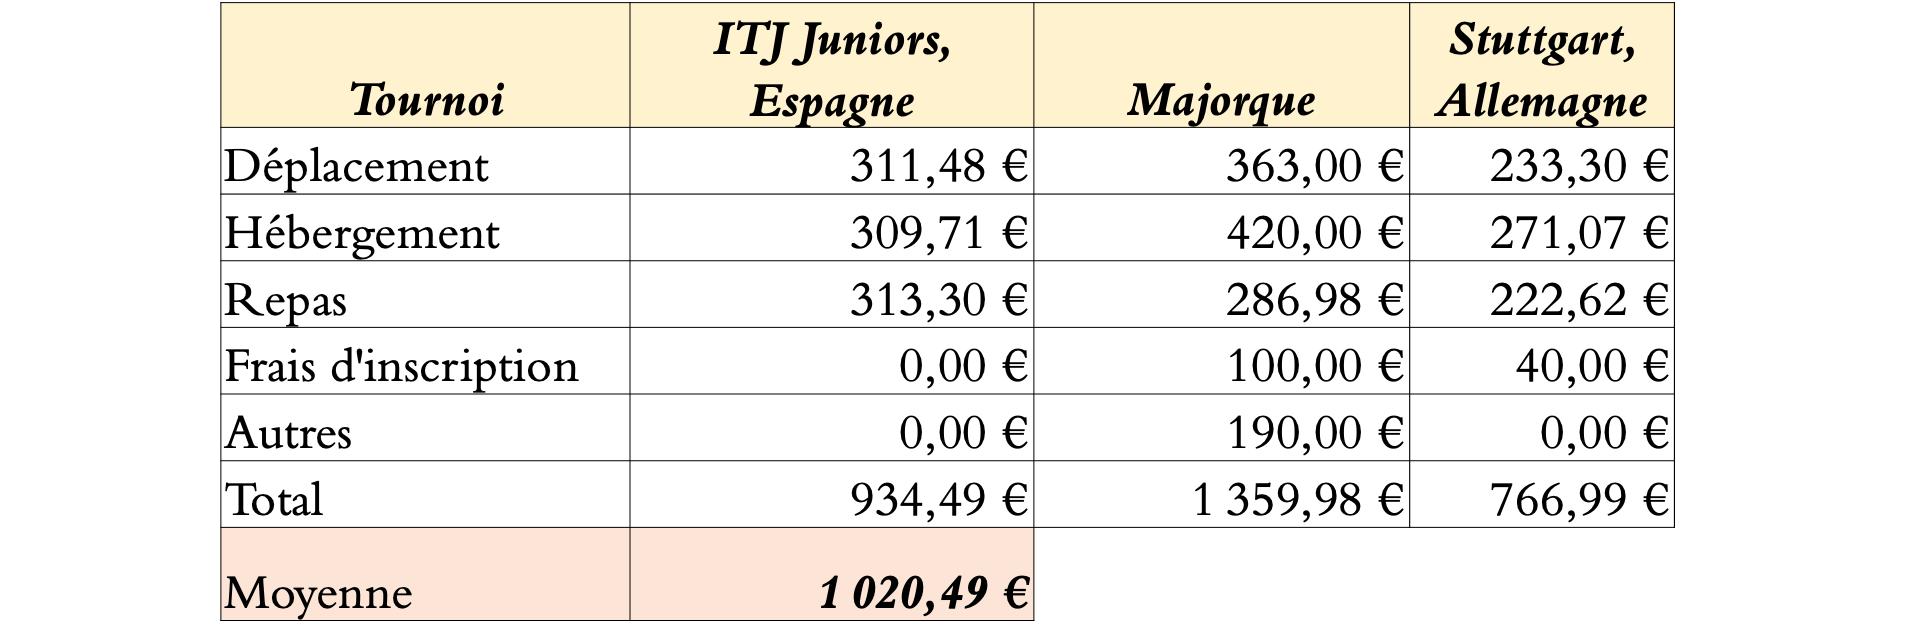 Budget moyen des tournois